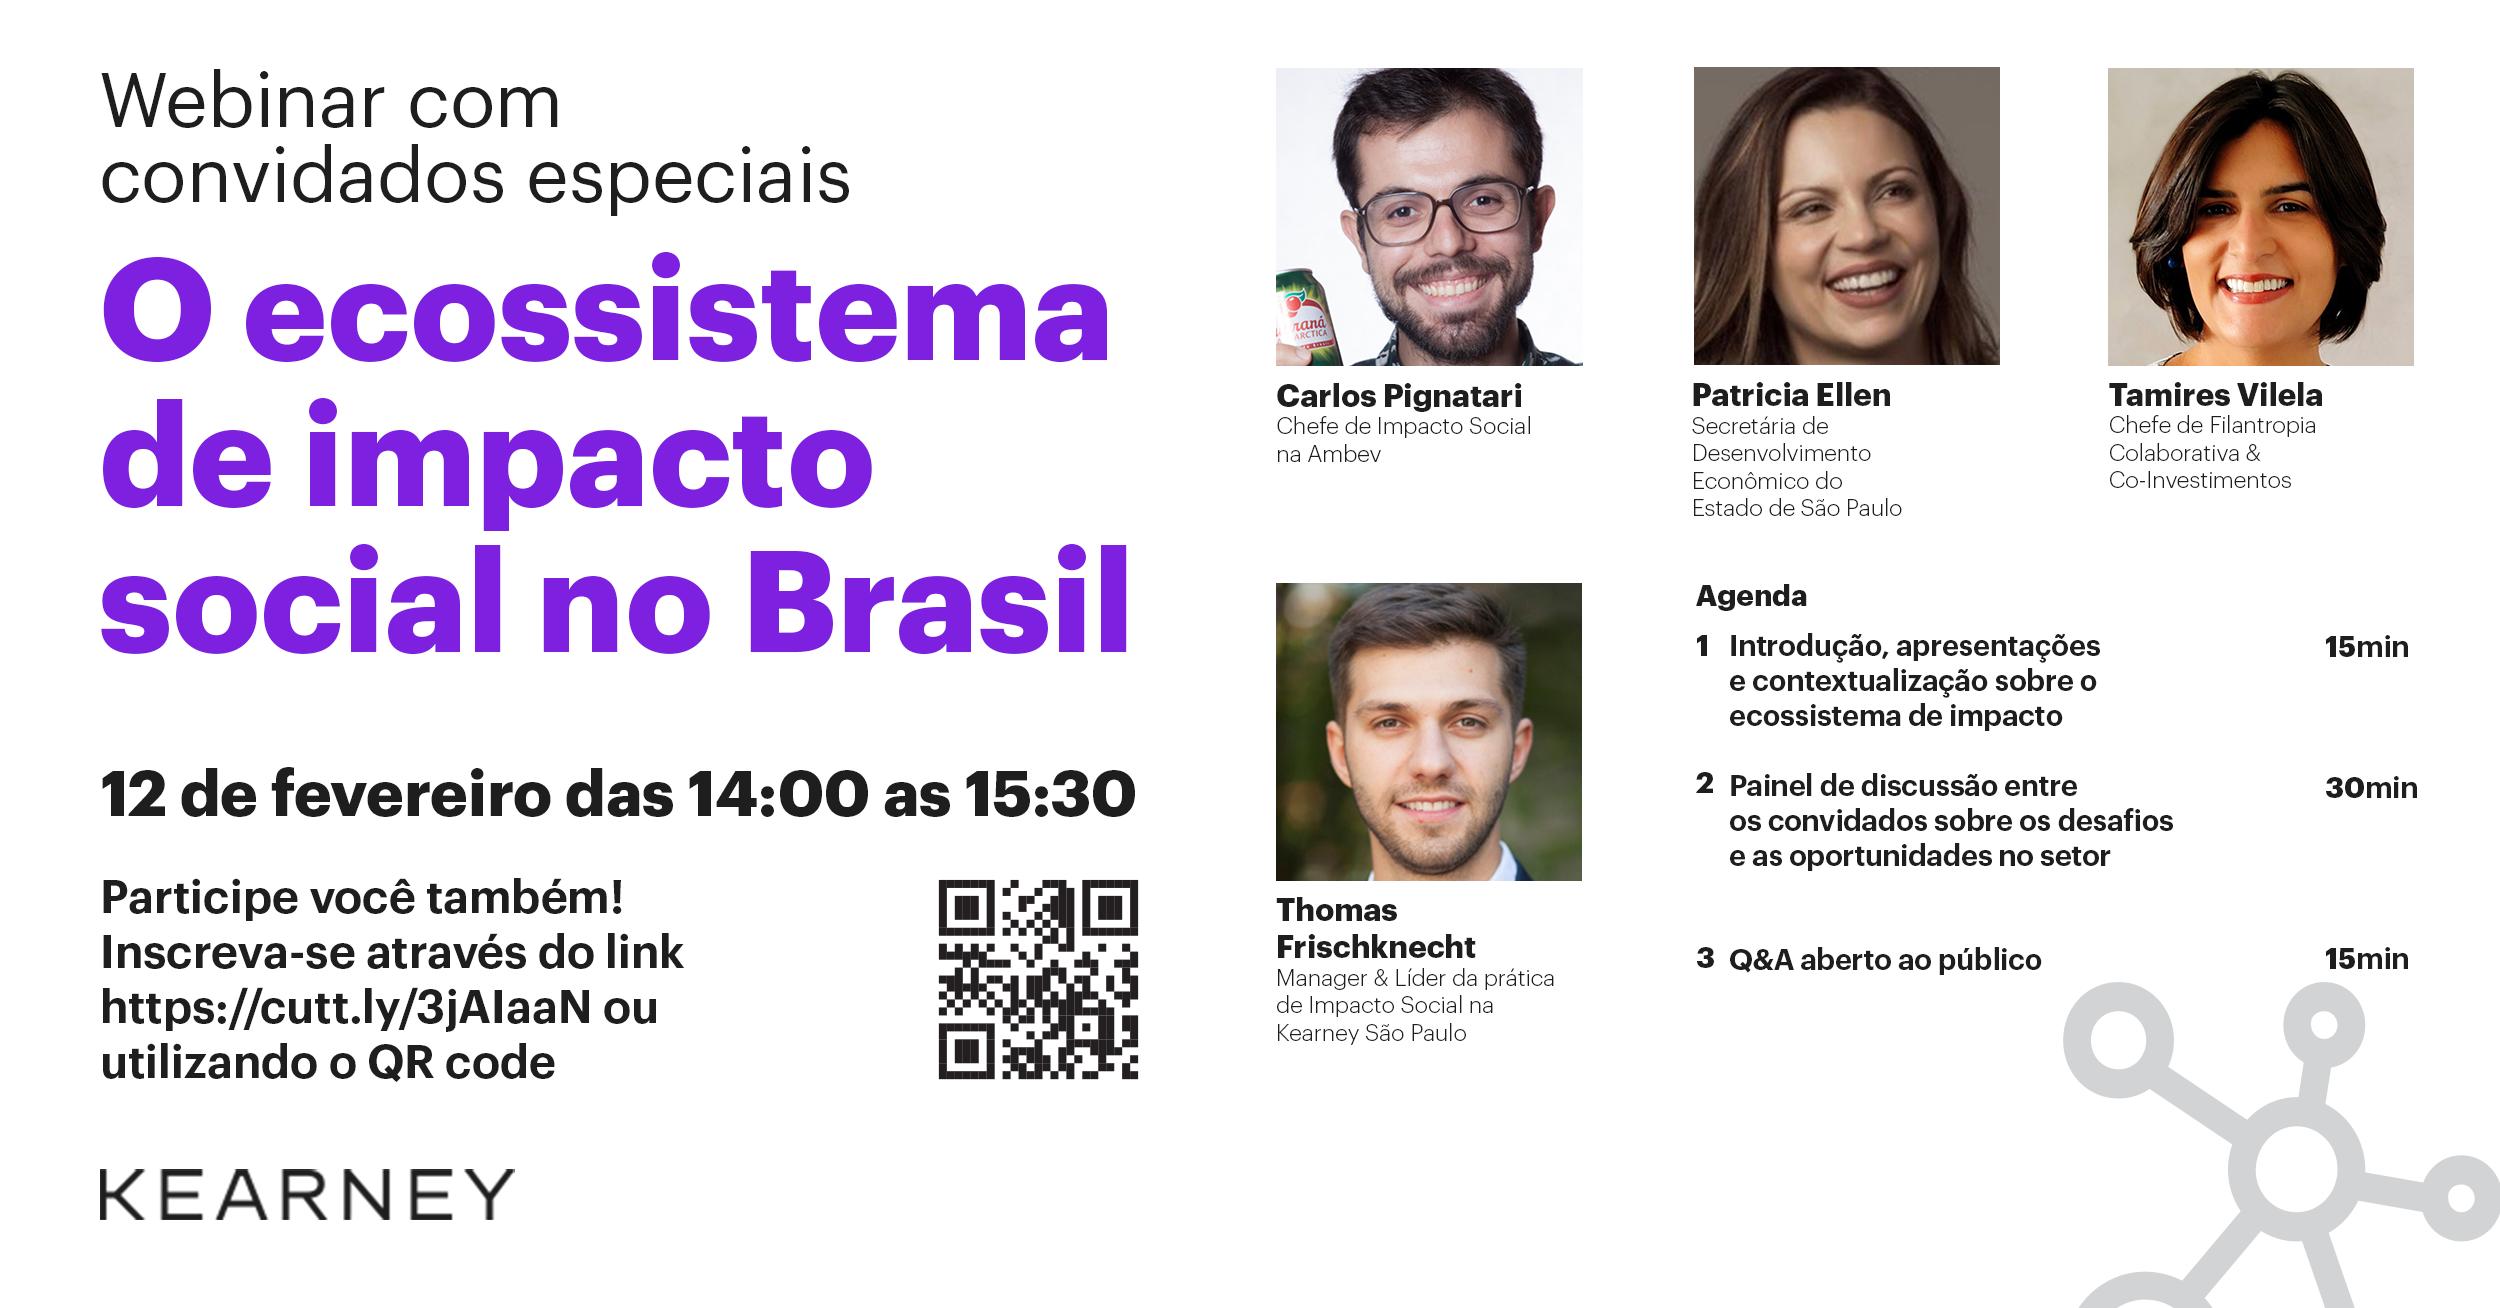 Kearney promove webinar para fomentar discussões sobre filantropia e investimentos de impacto social no Brasil